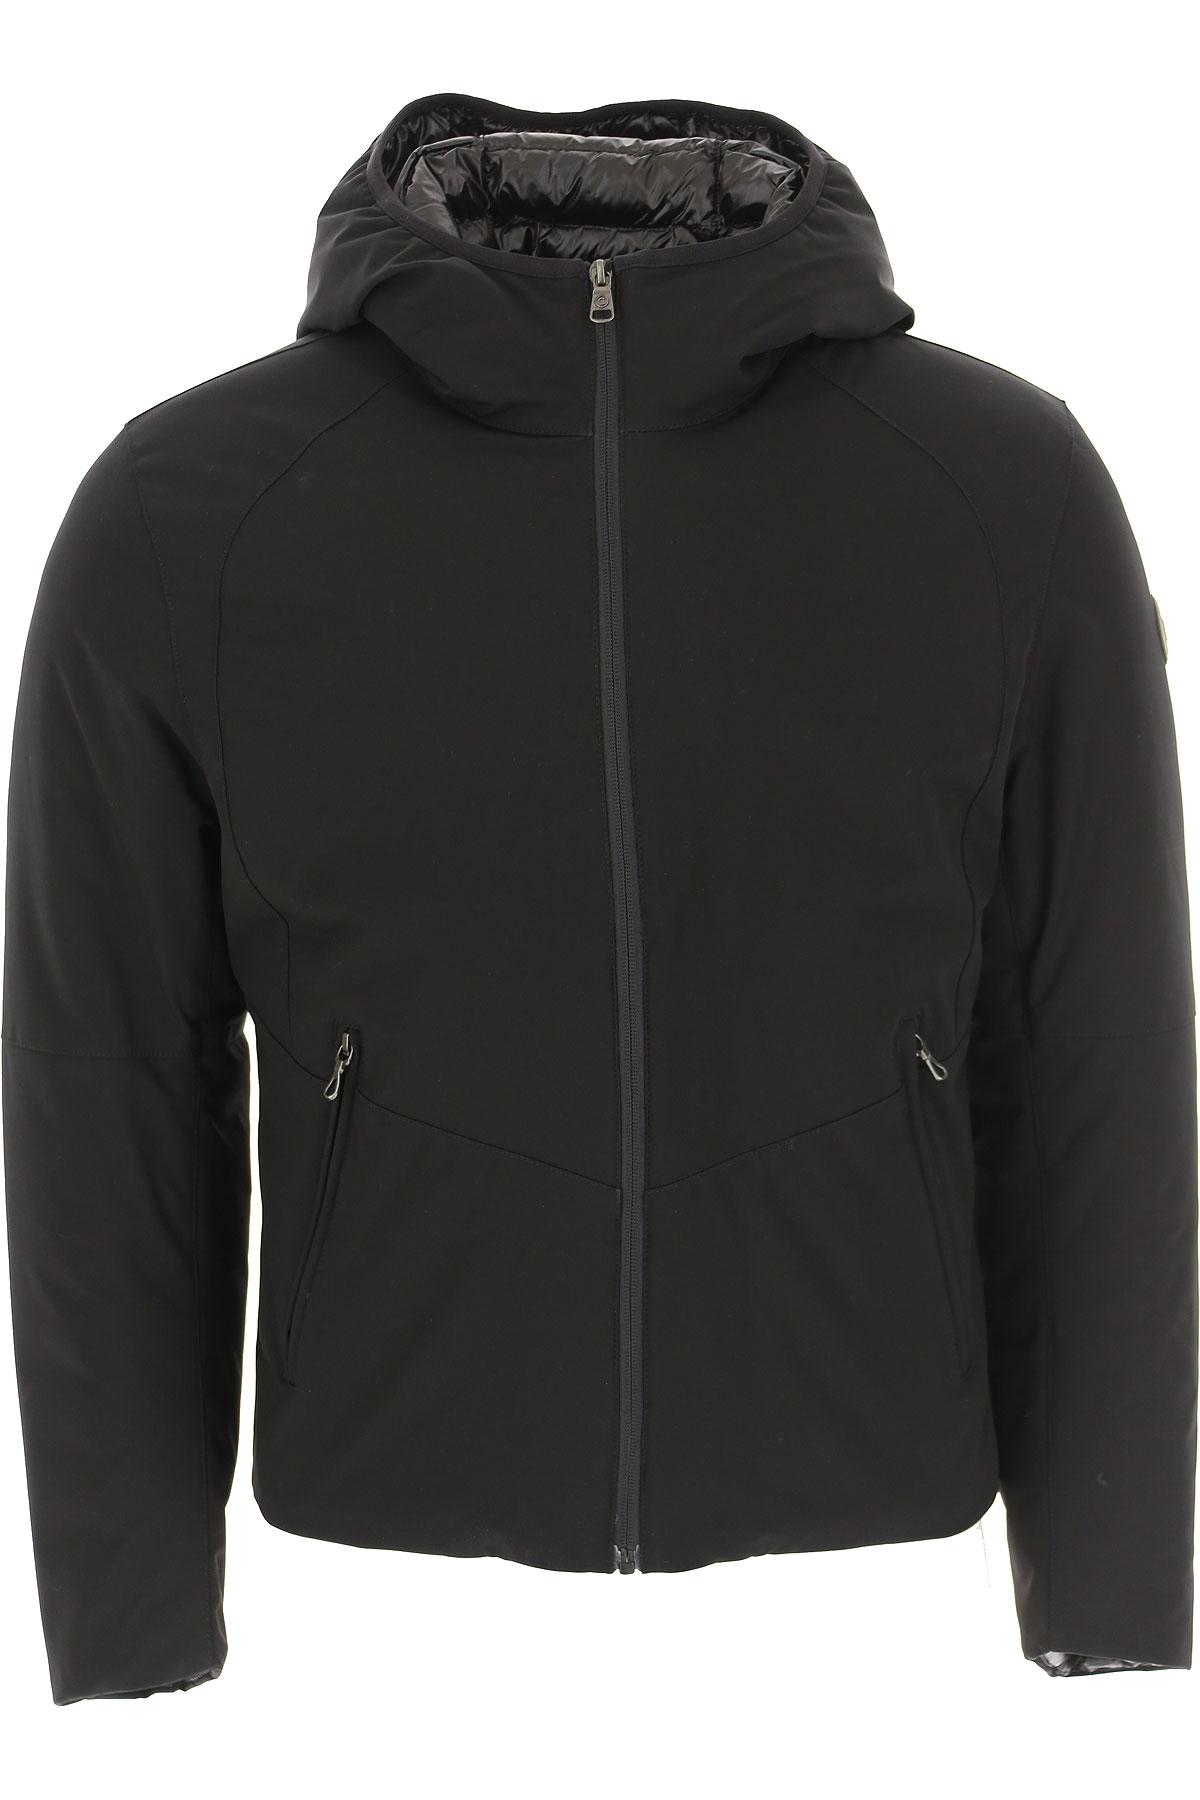 Colmar Down Jacket for Men, Puffer Ski Jacket On Sale, Black, polyester, 2019, M S XL XXL XXXL